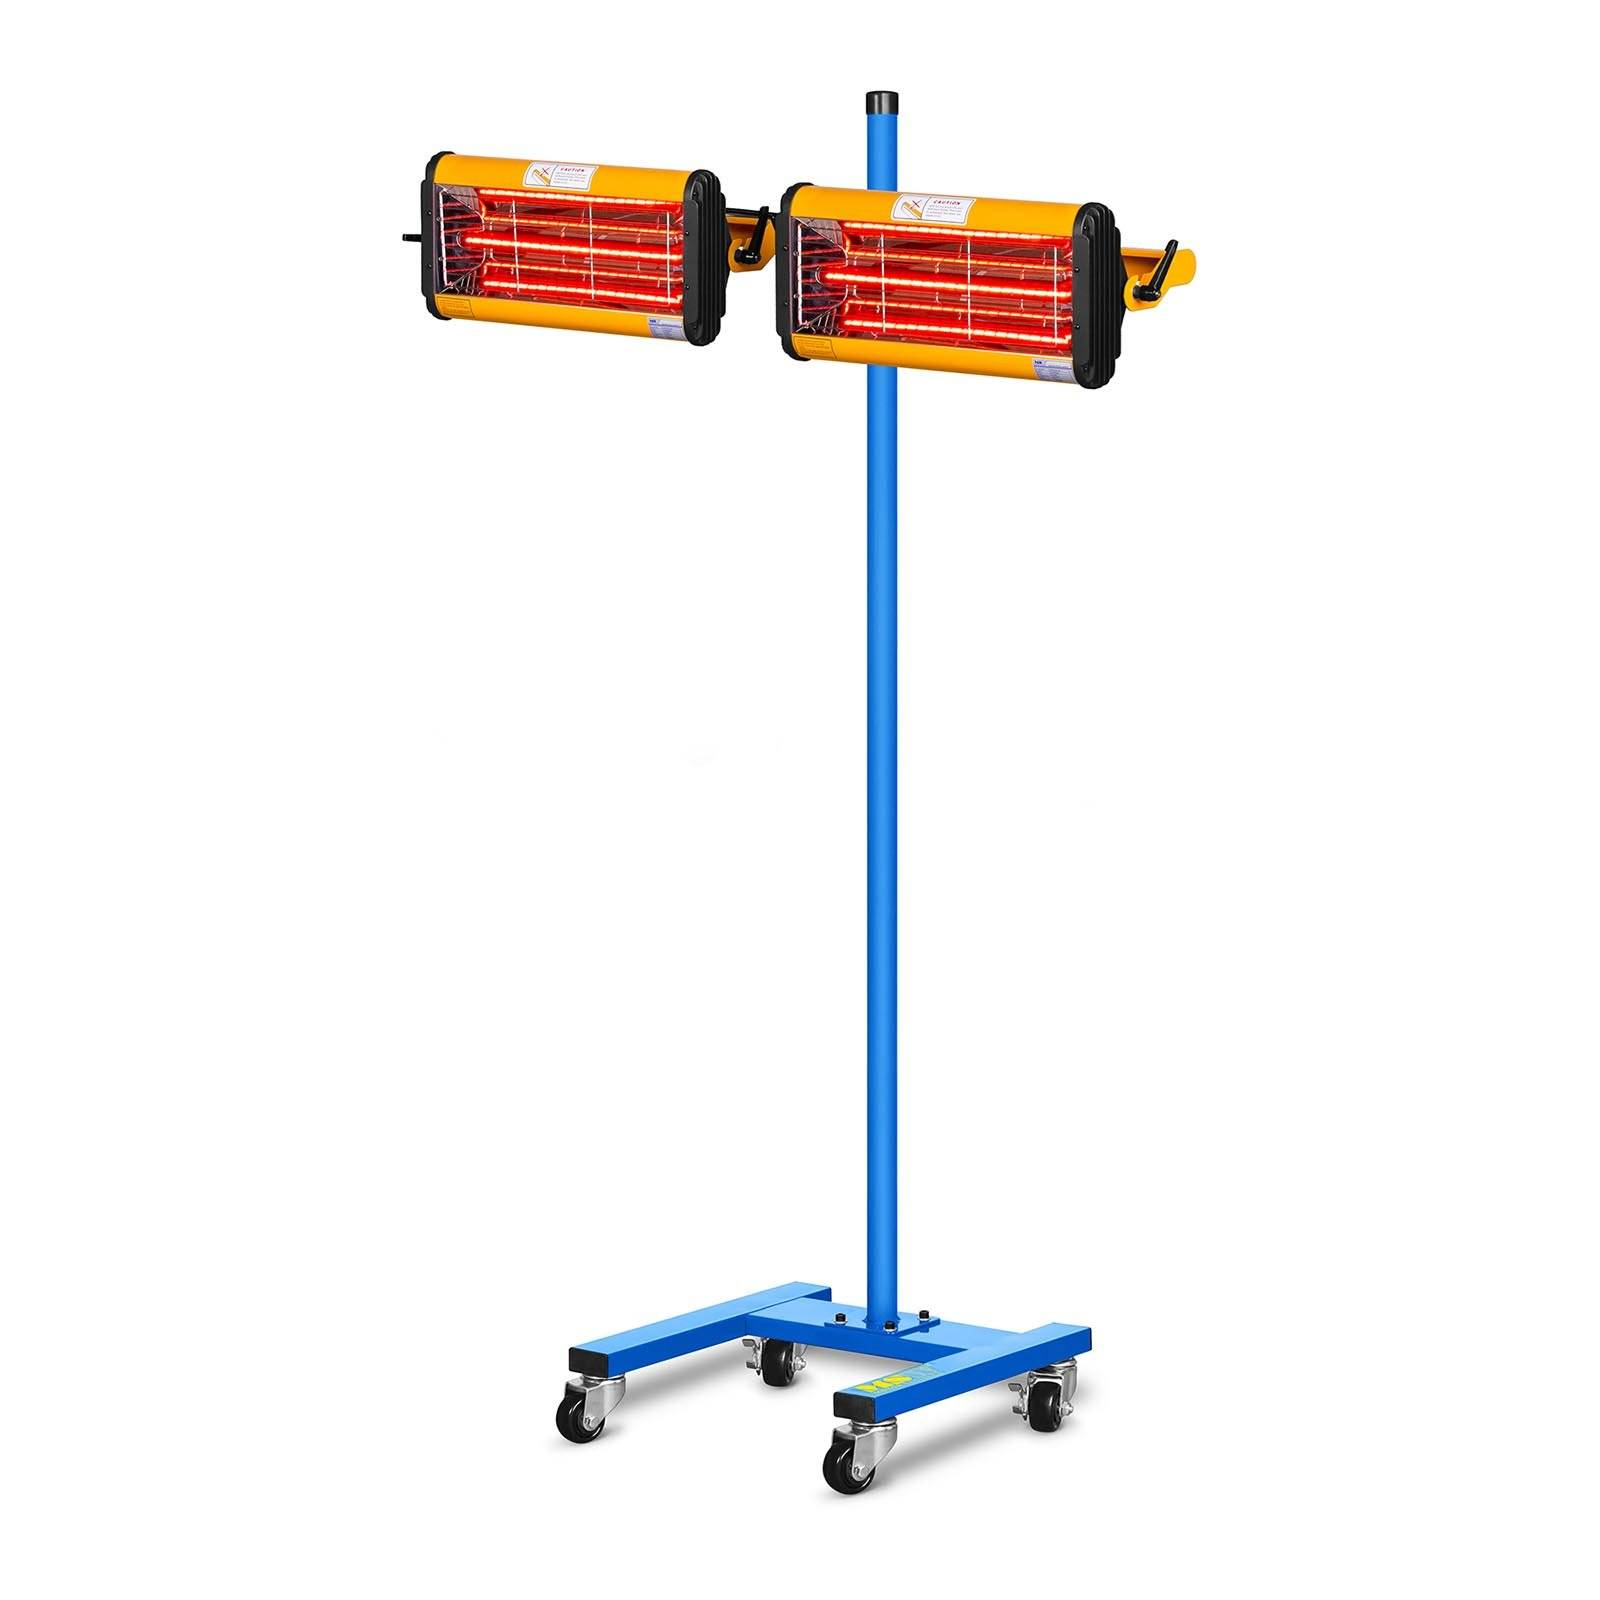 MSW Lampe infrarouge carrosserie - 2200 W - 2 émetteurs IR-DRYER2000.2